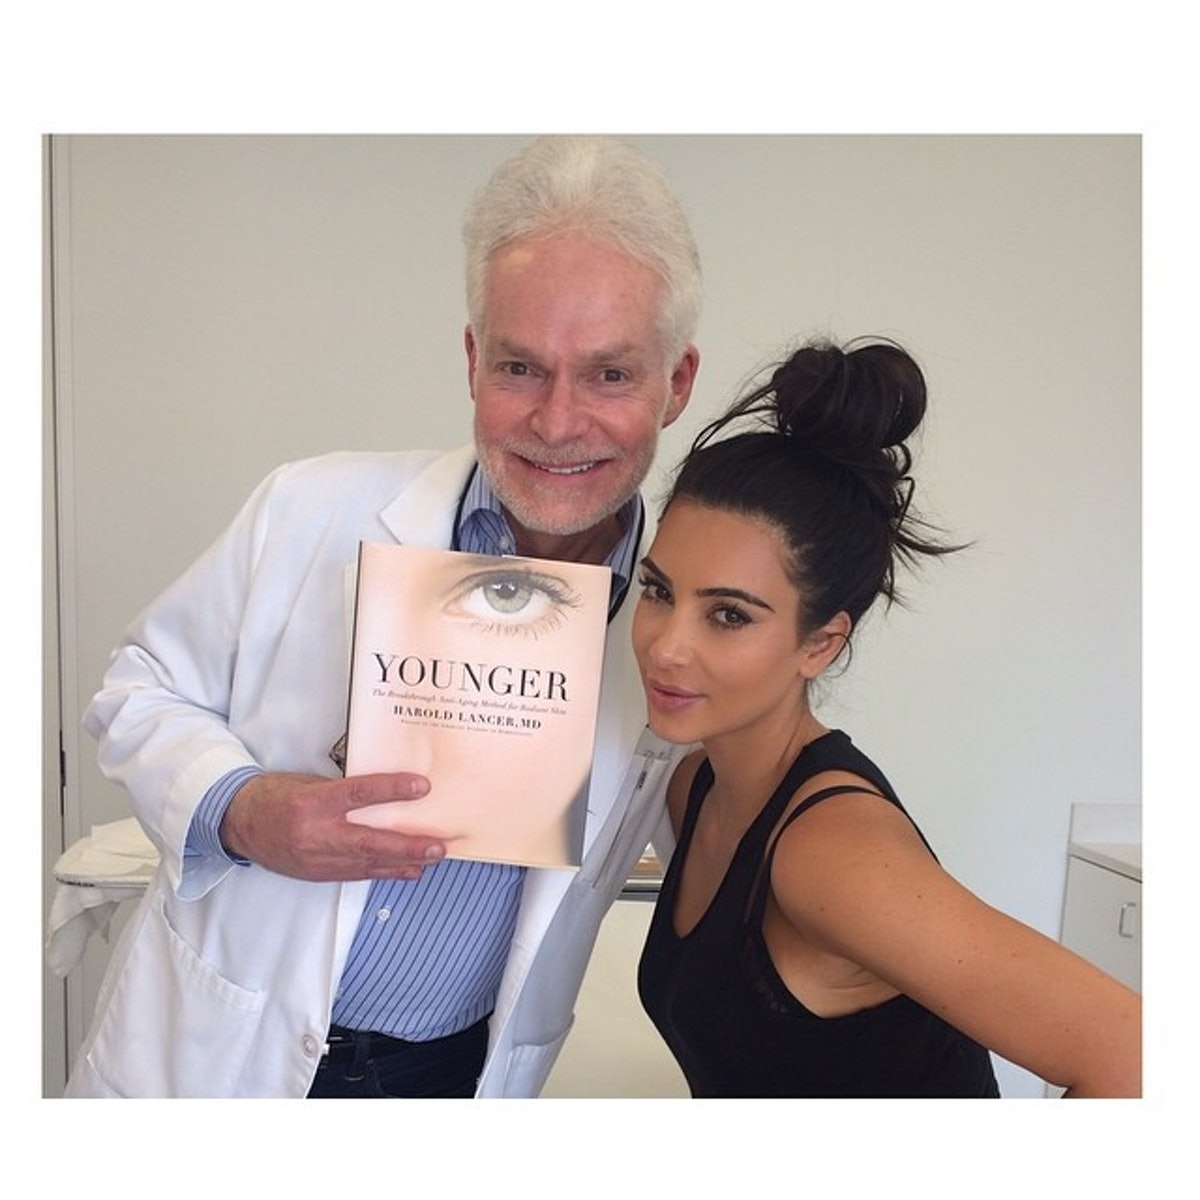 Kim Kardashian and Dr. Lancer